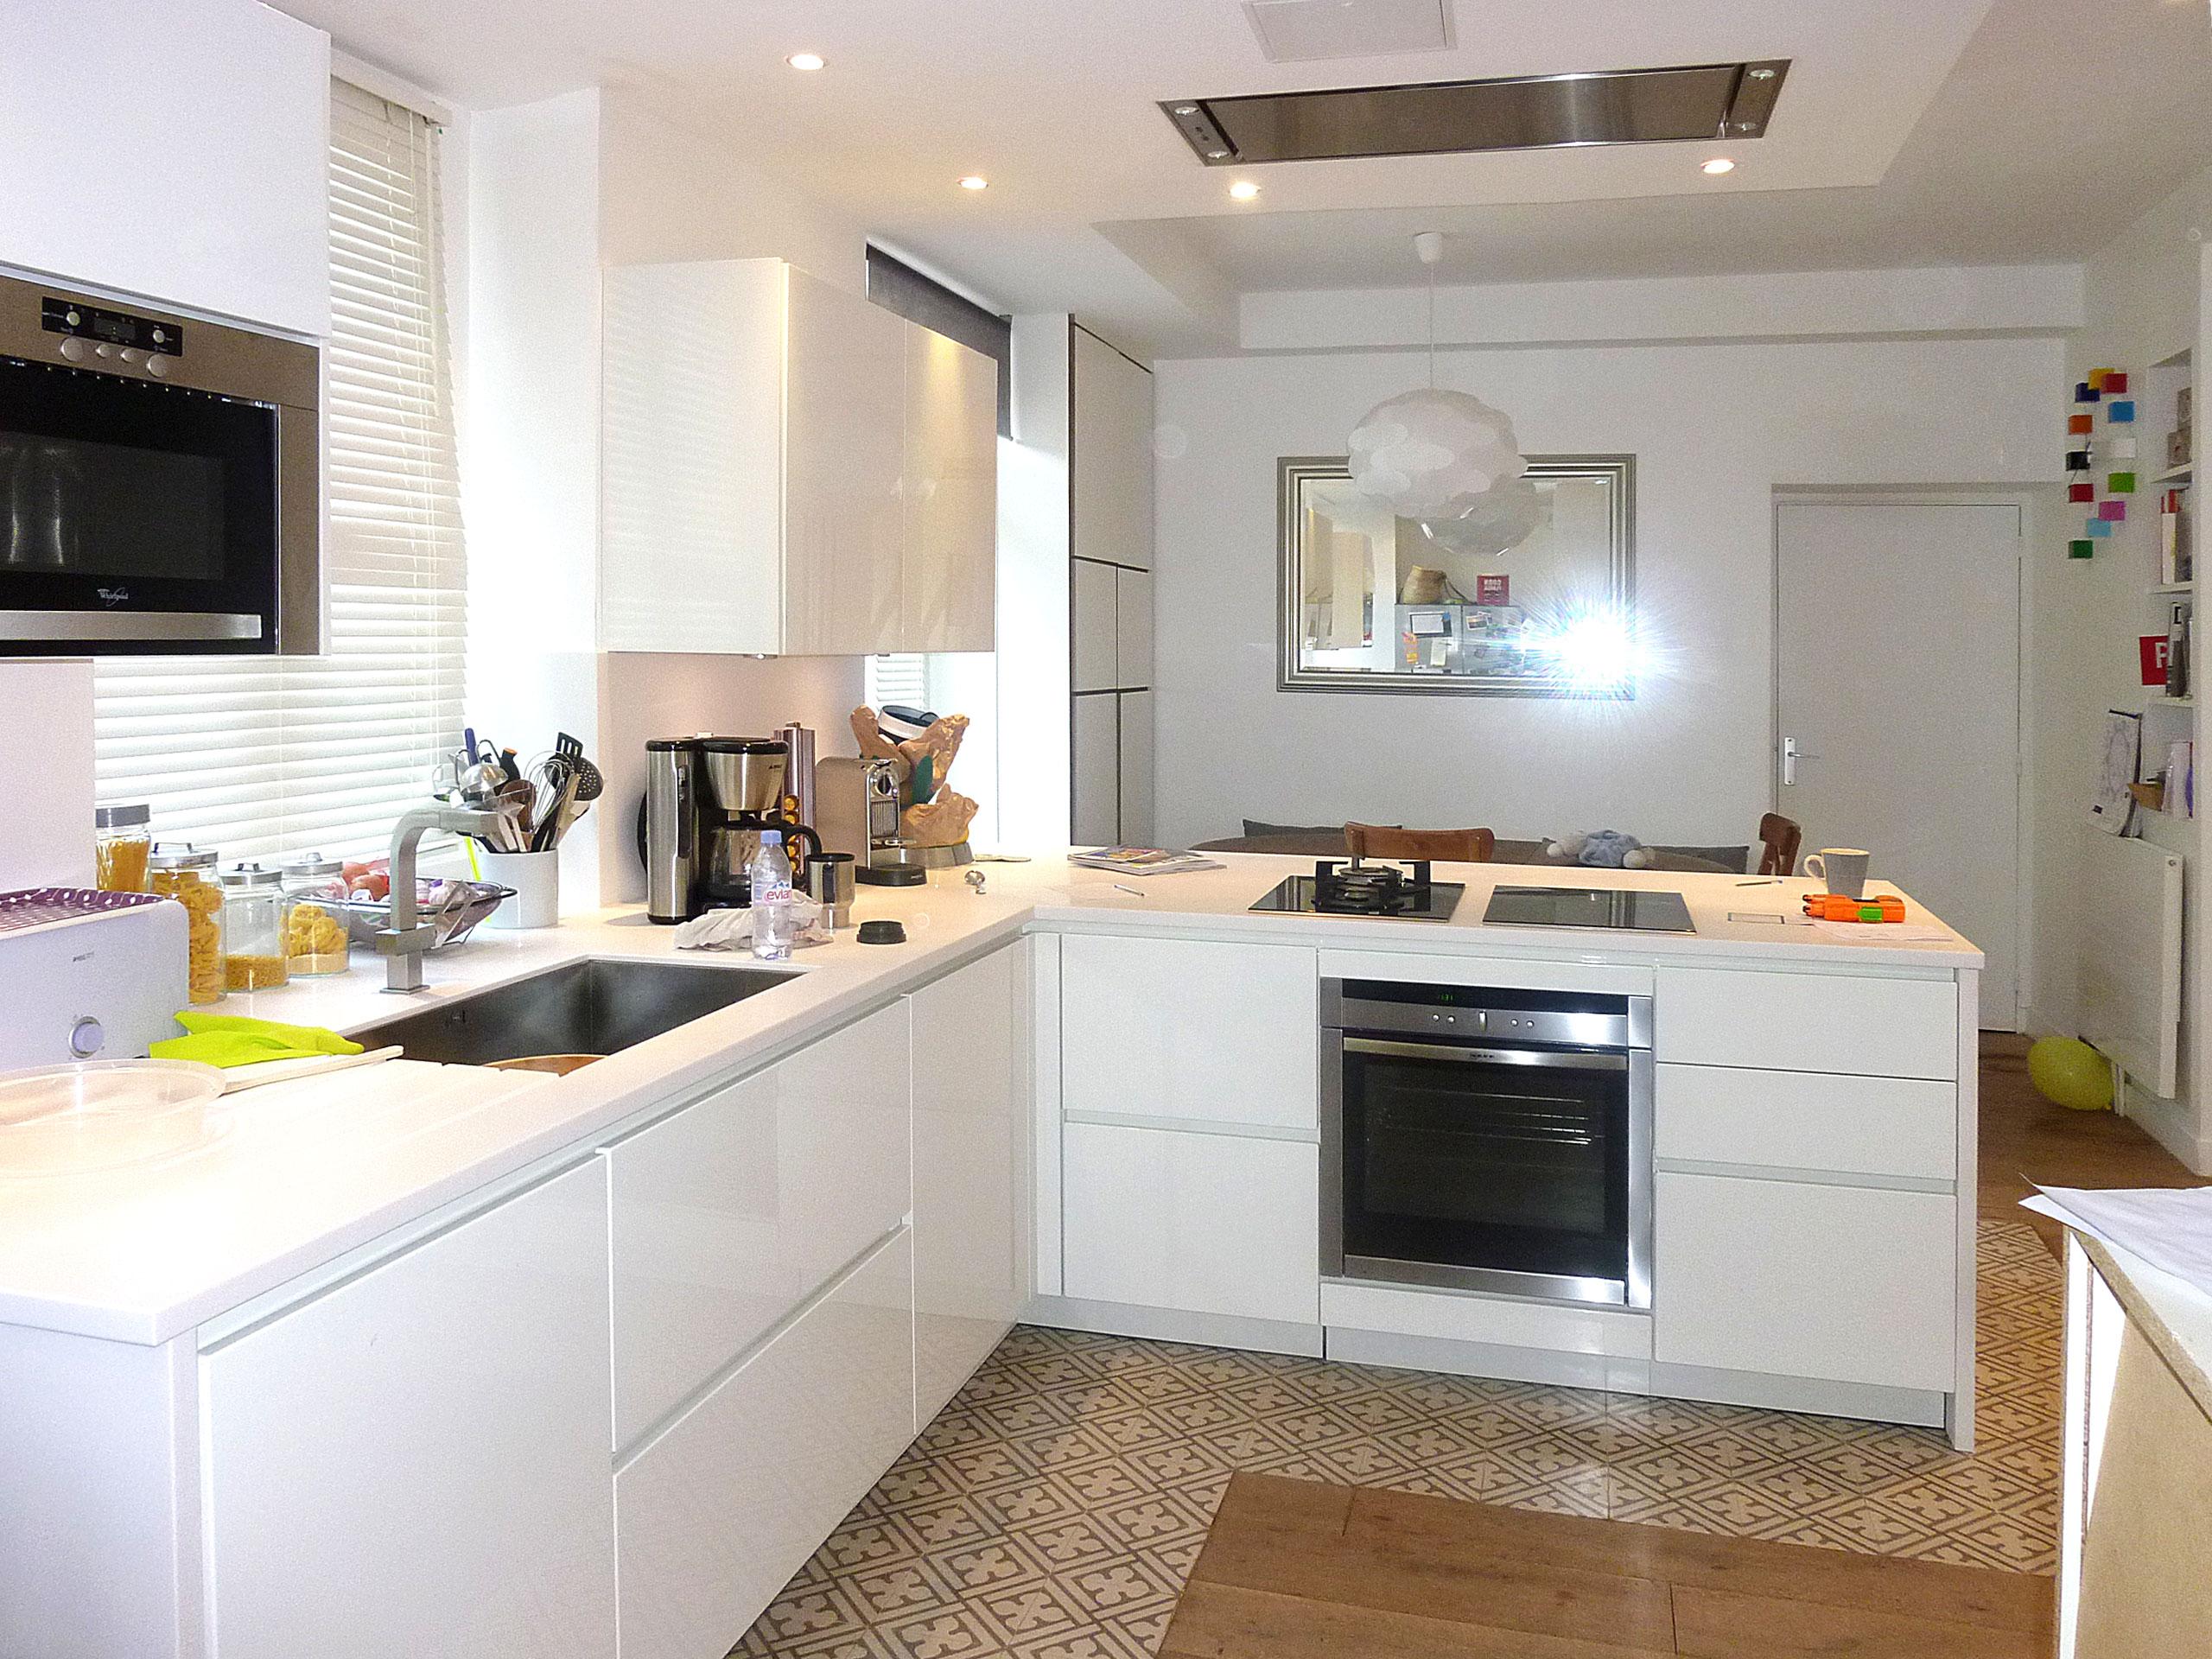 olivier-stadler-architecte-meudon-rehabilitation-extensions-maison (12)